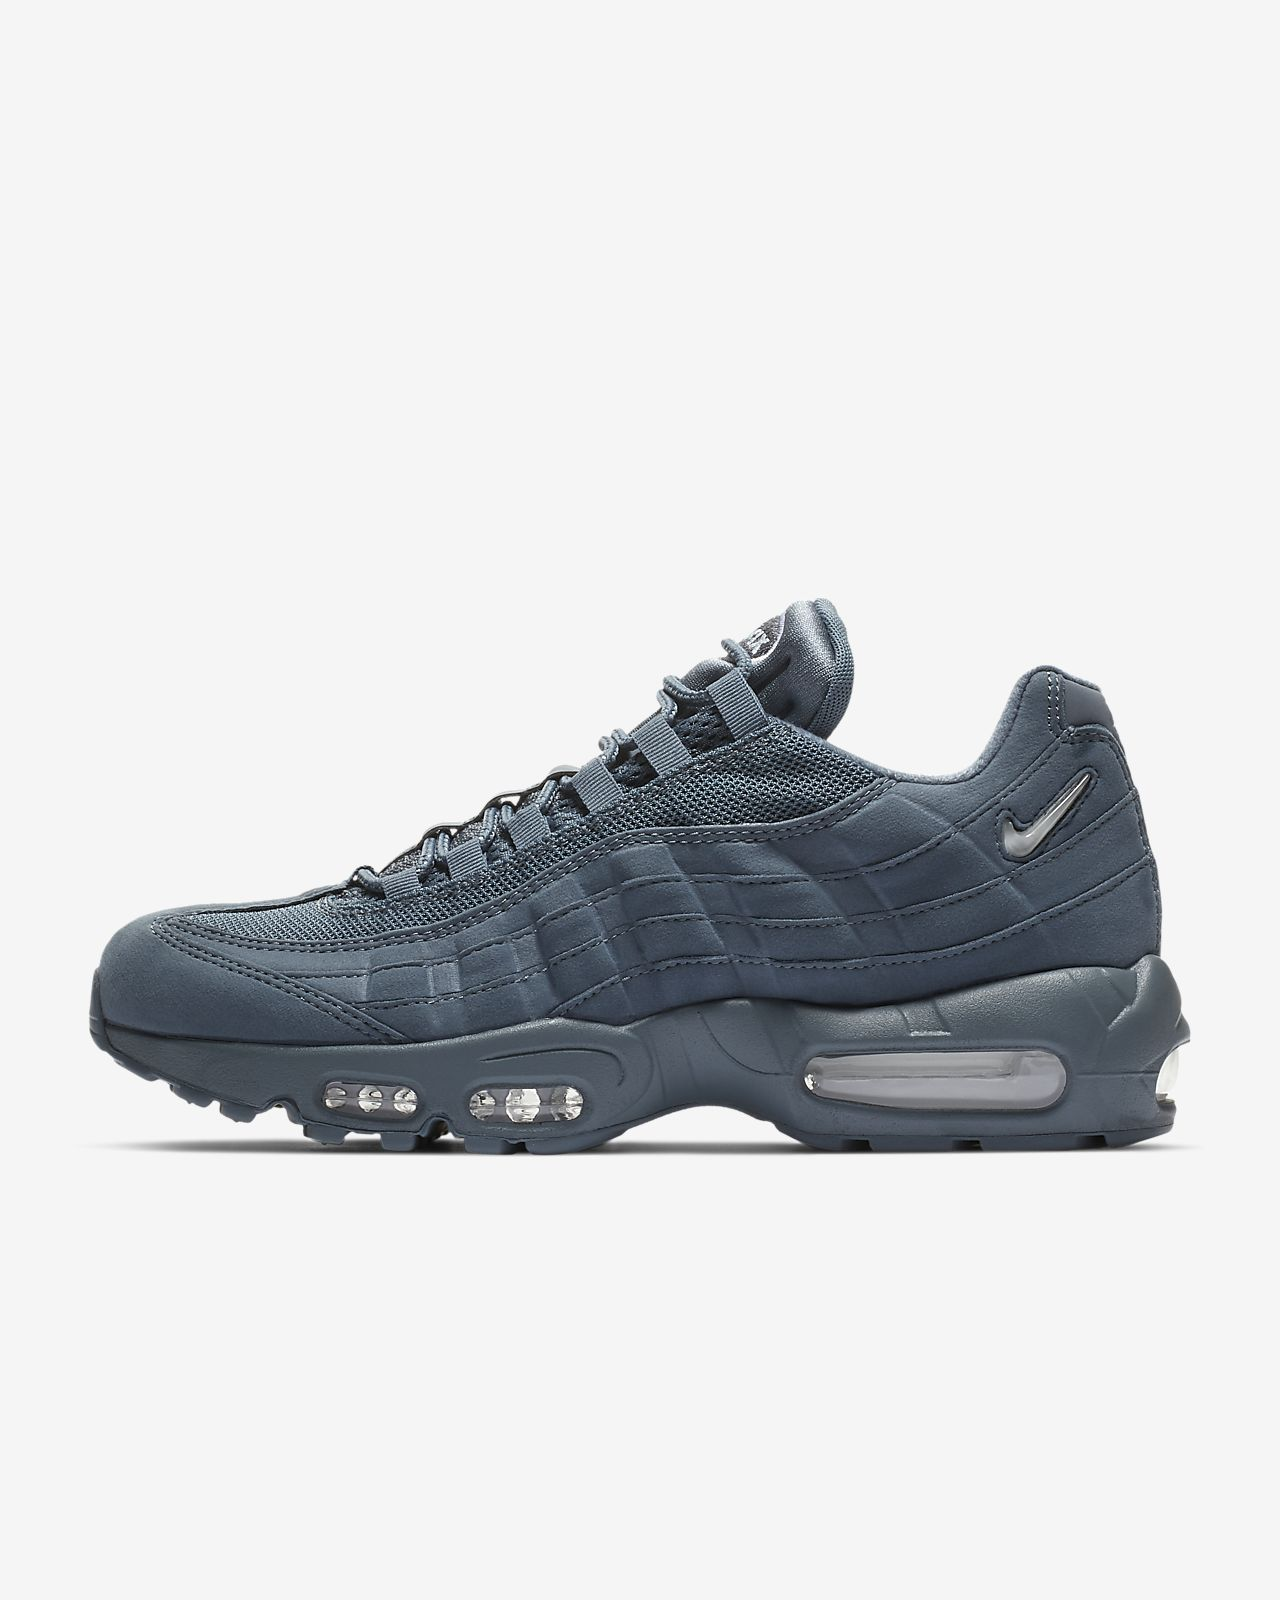 42fd3164710e0f Nike Air Max 95 SC Men s Shoe. Nike.com GB